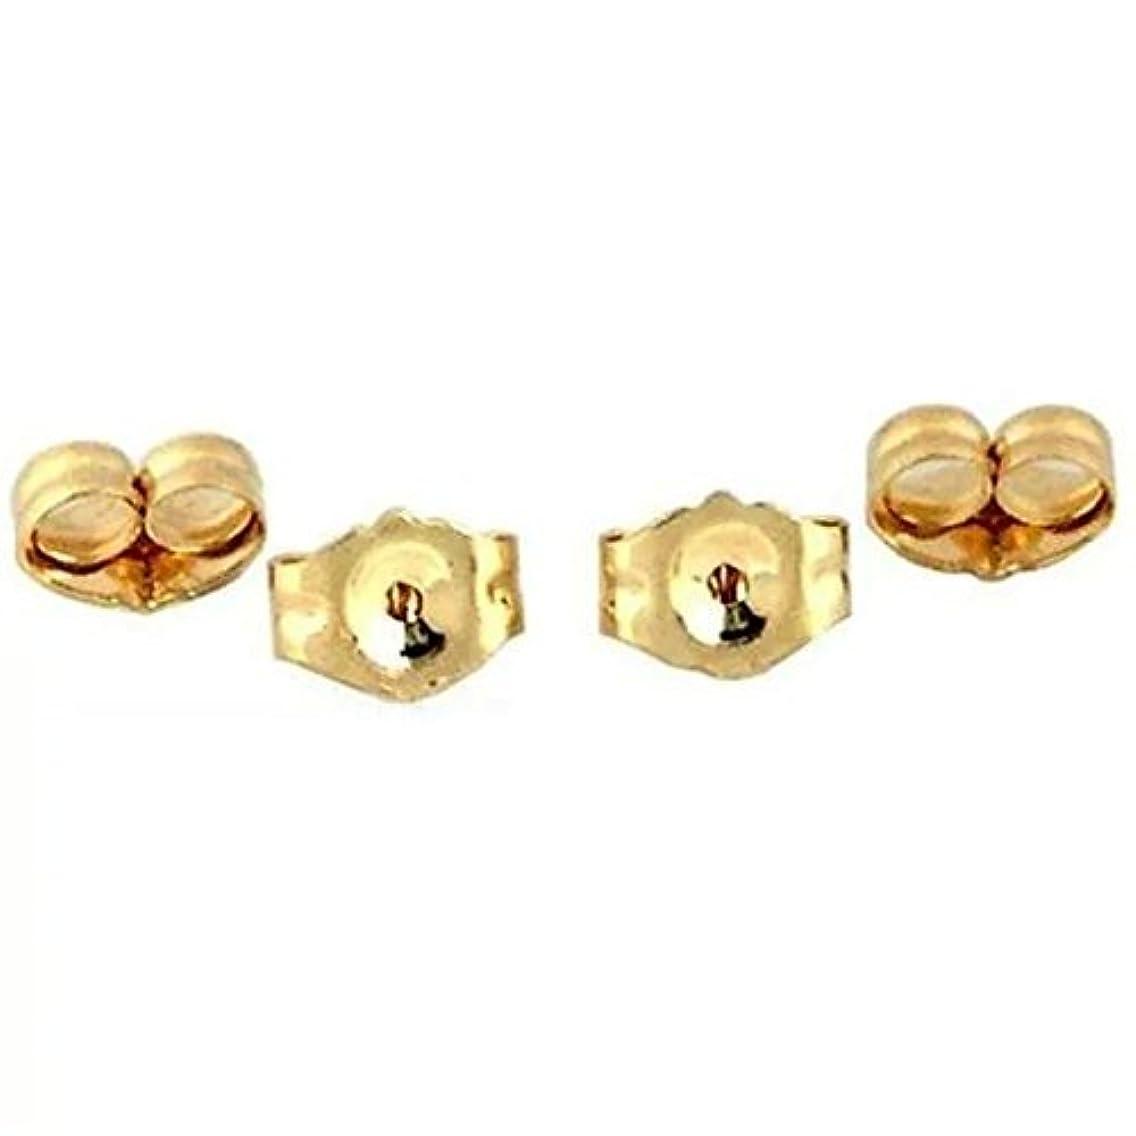 14K Gold Earring Backs - 4 Piece Replacement Earring Backs